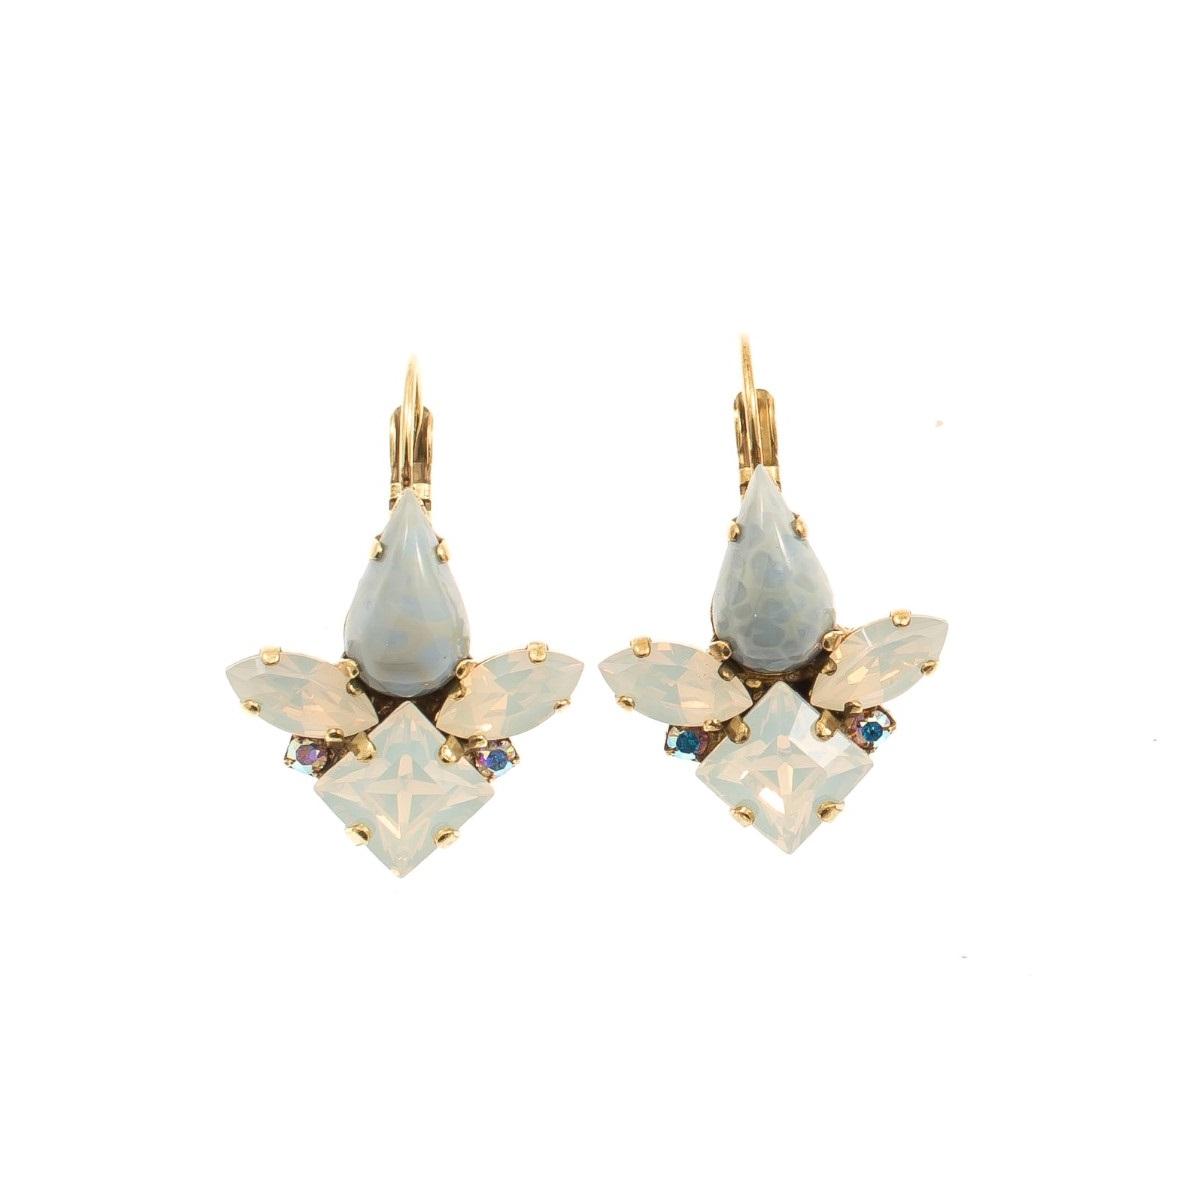 ARTWEAR DIMITRIADIS - Γυναικεία σκουλαρίκια ARTWEAR DIMITRIADIS με στρας γυναικεία αξεσουάρ κοσμήματα σκουλαρίκια